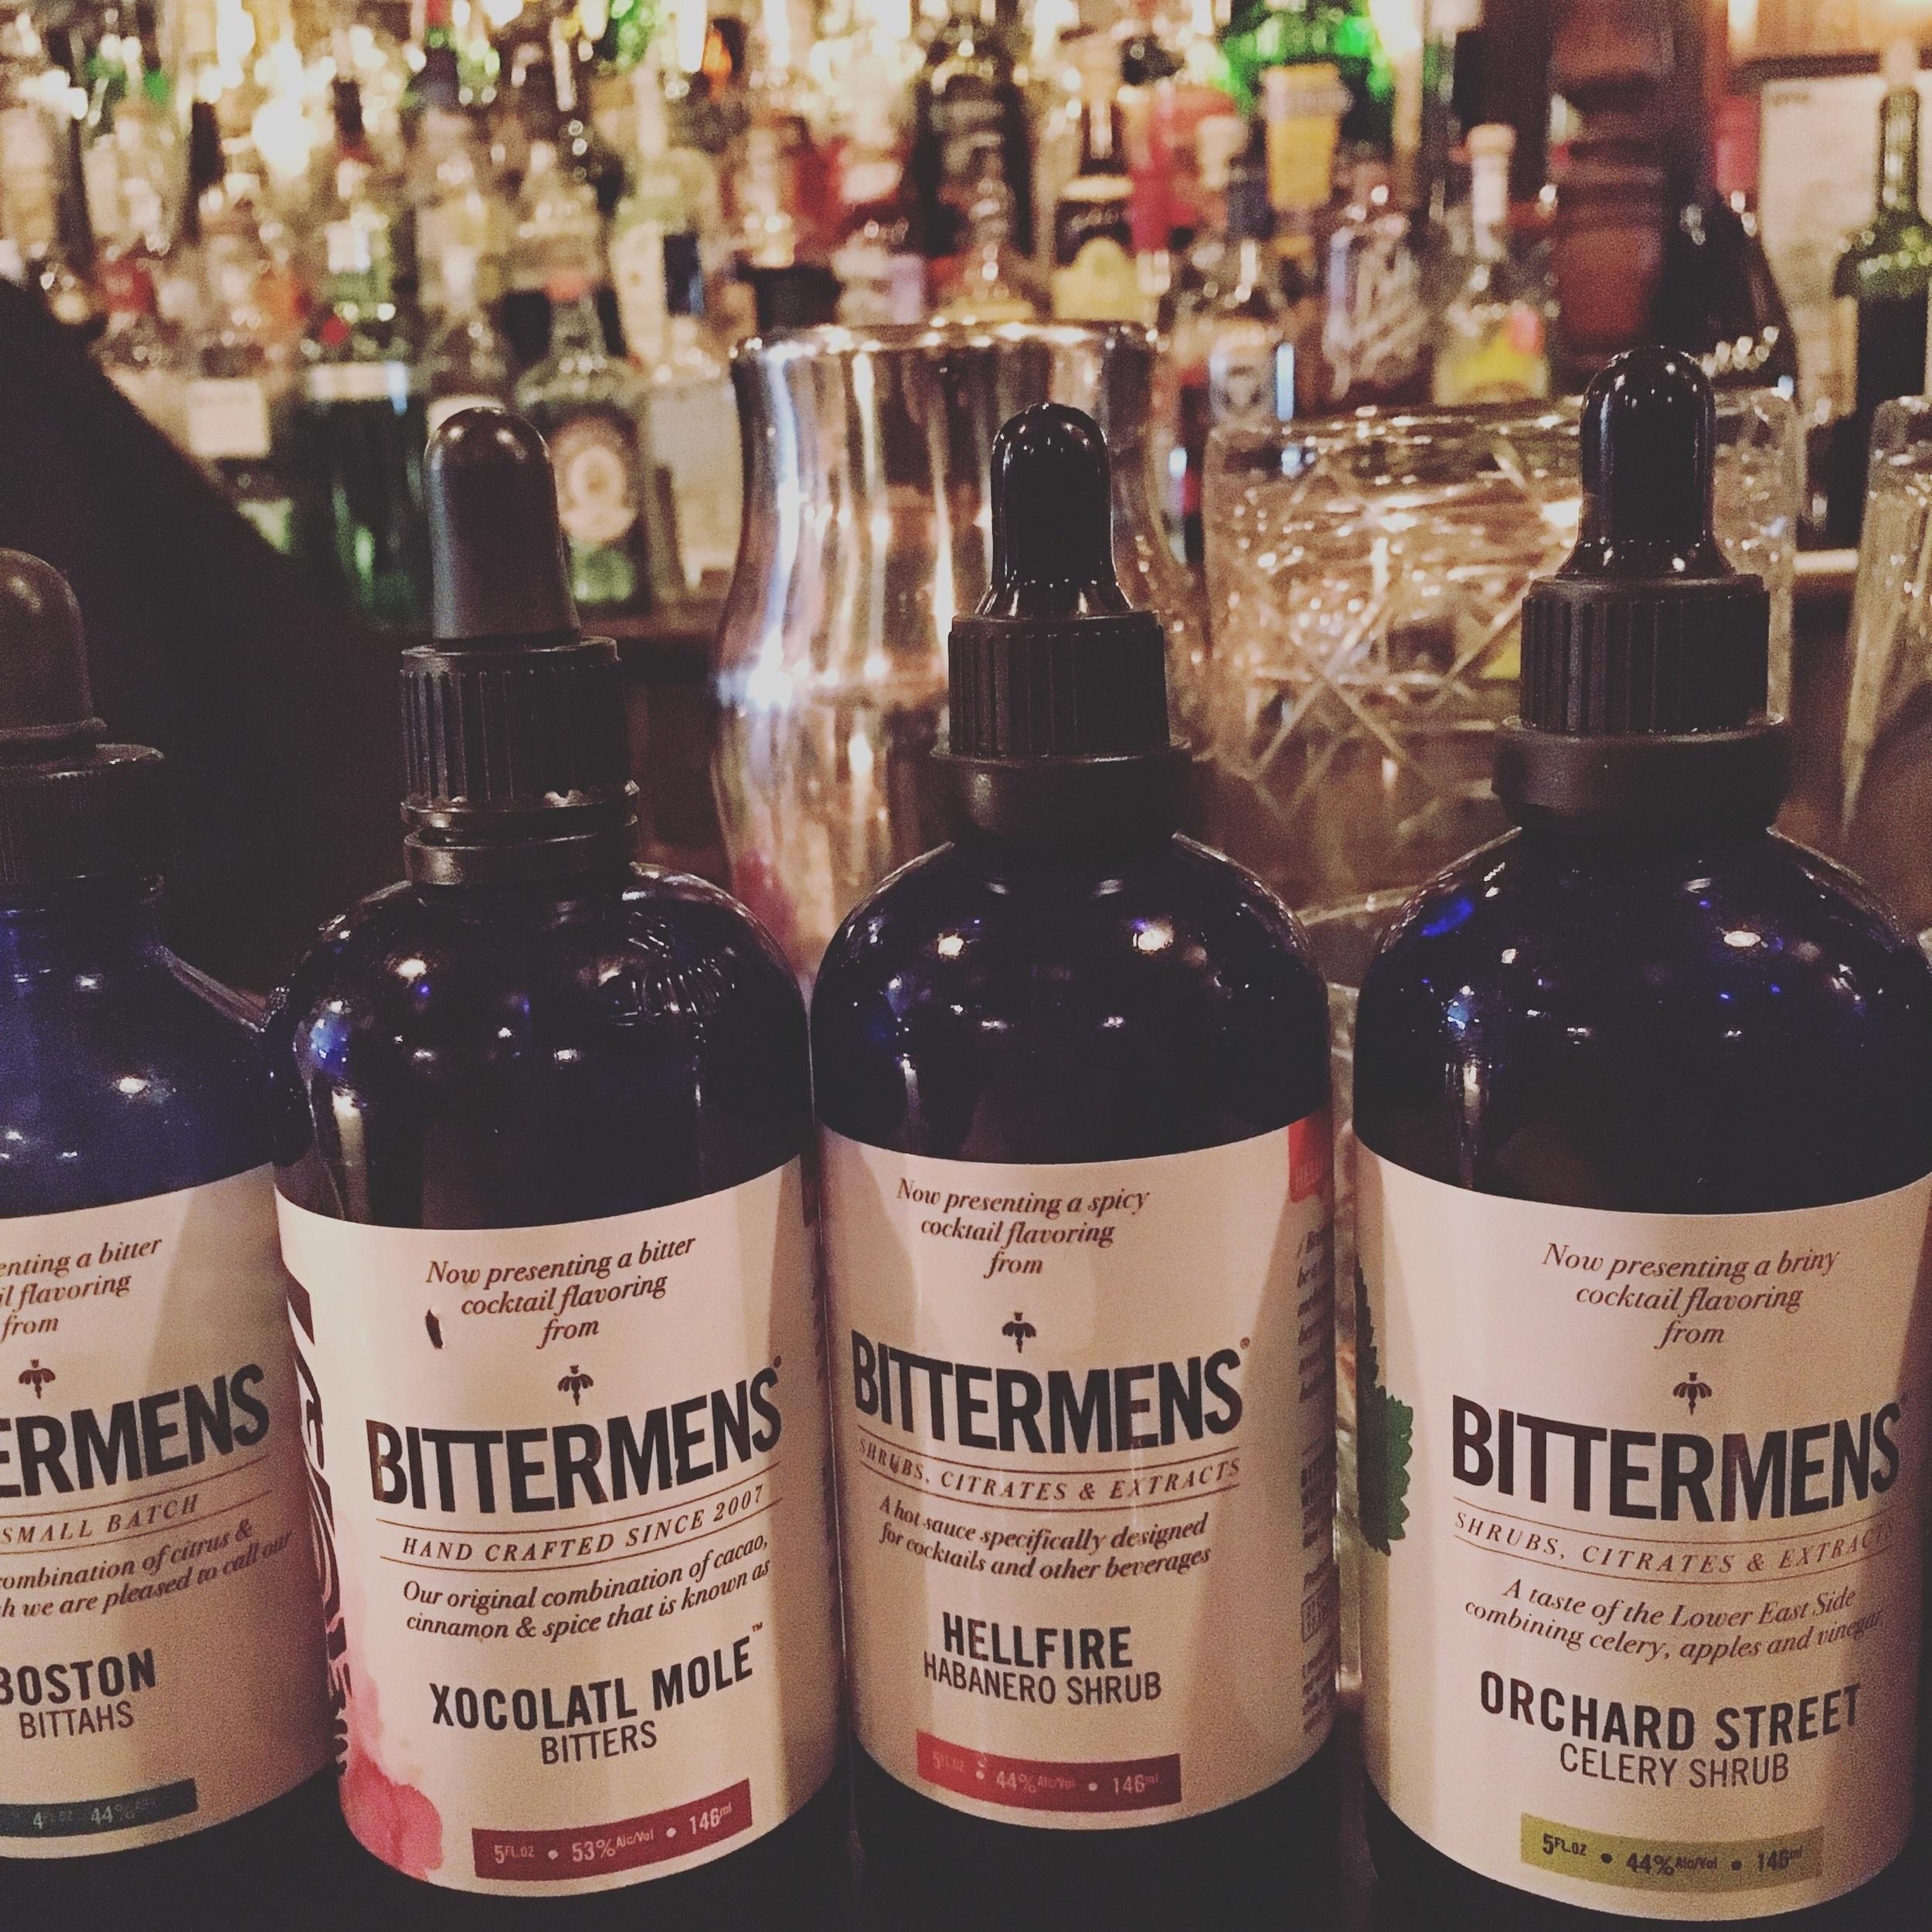 Made in Brooklyn Bitters